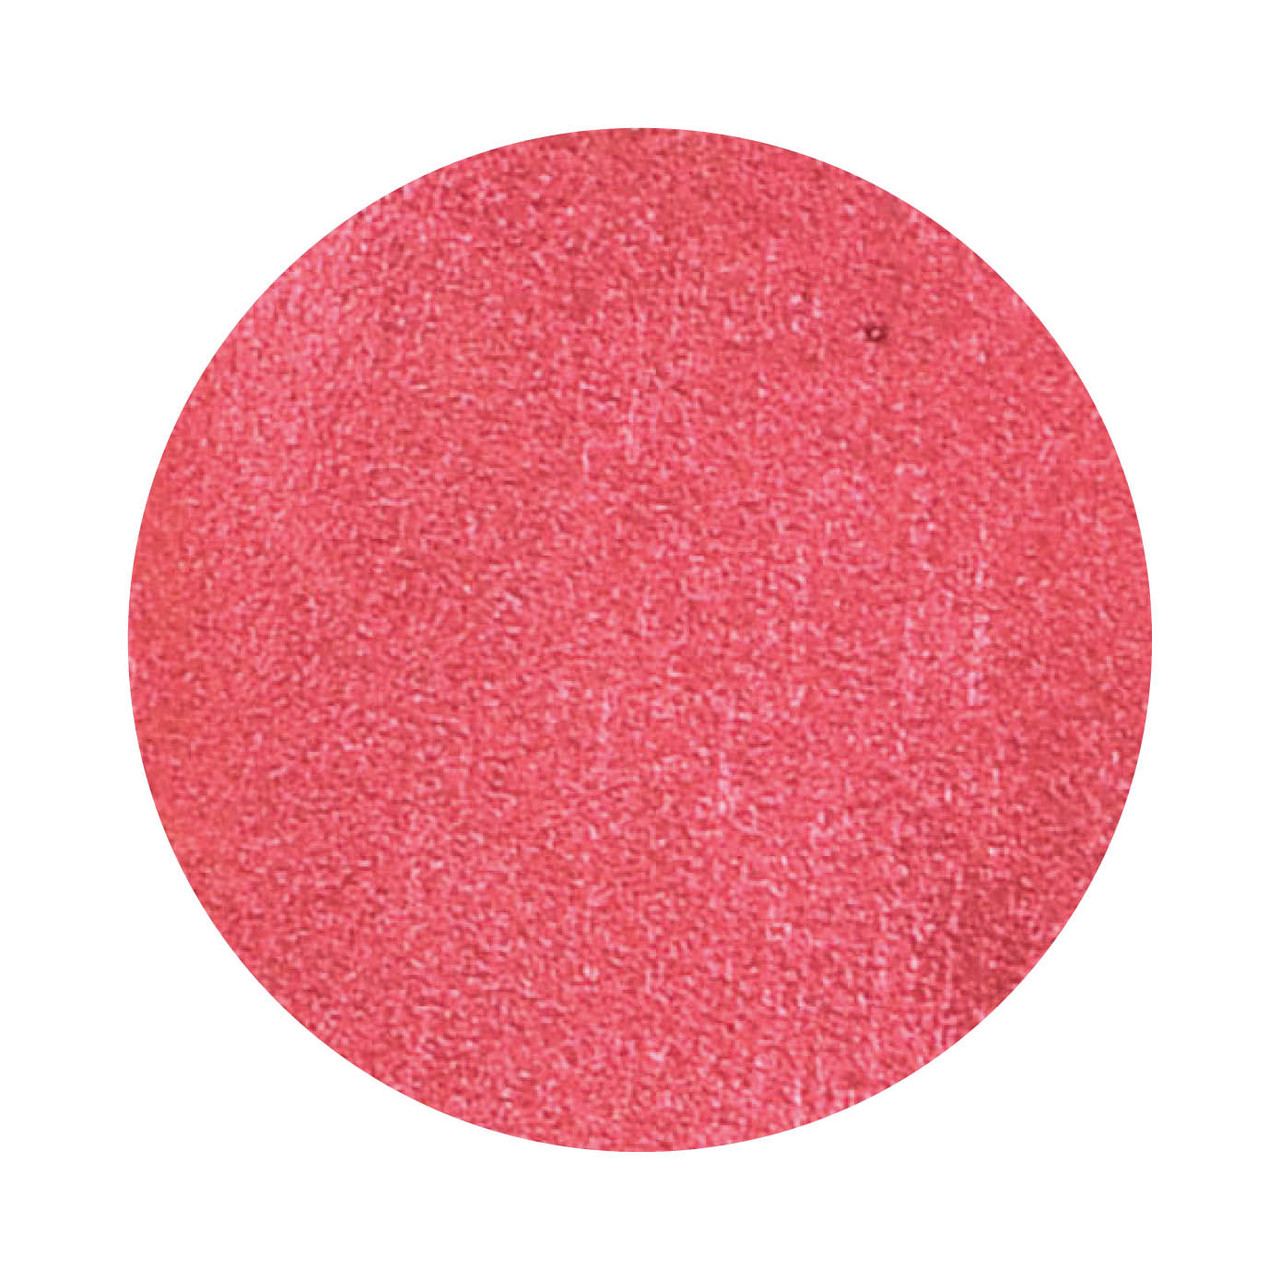 Rose Red on fondant